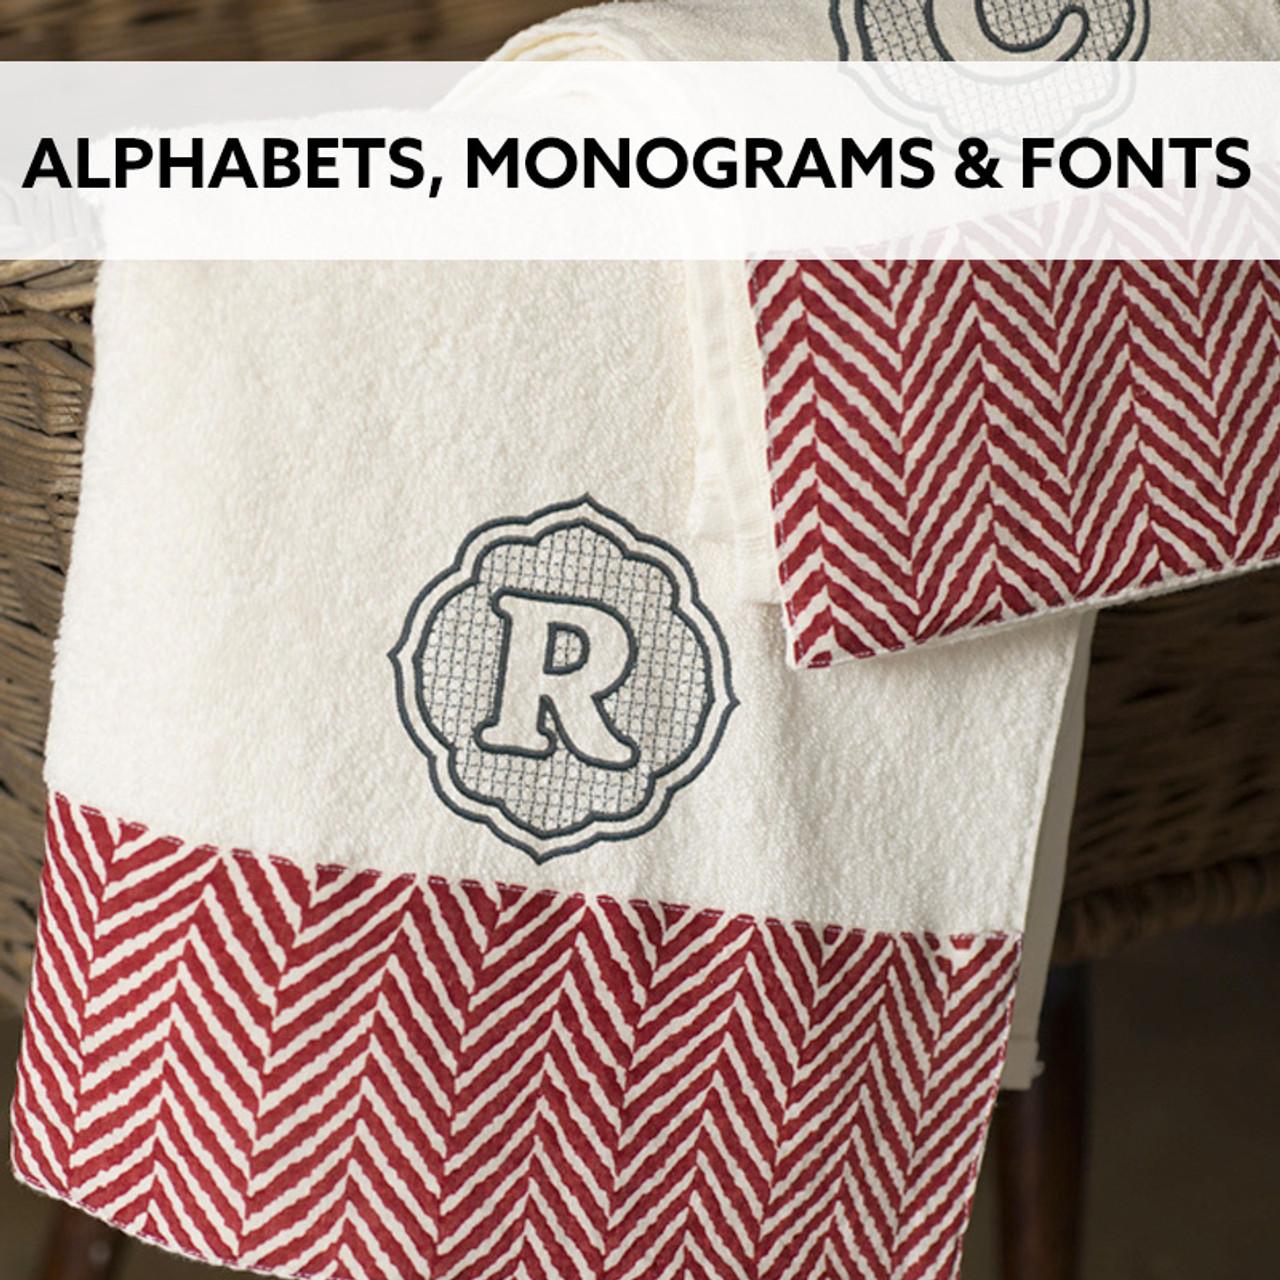 Alphabets Monograms & Fonts